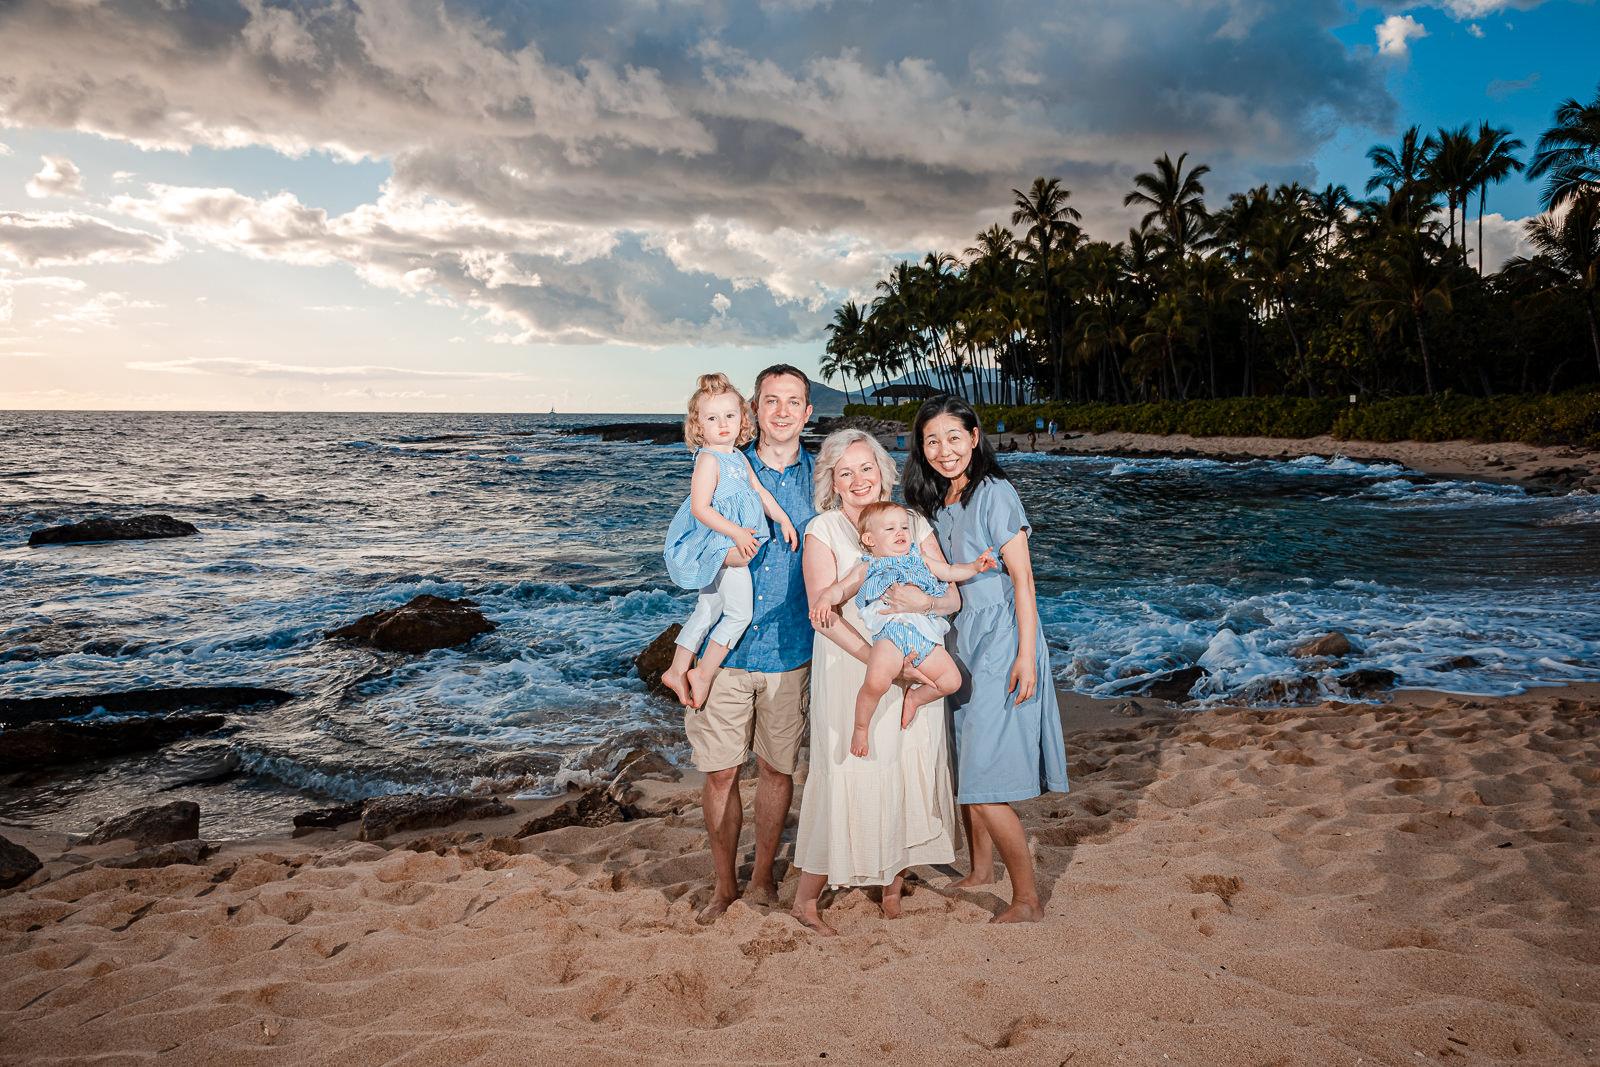 Oahu2019-9232.jpg